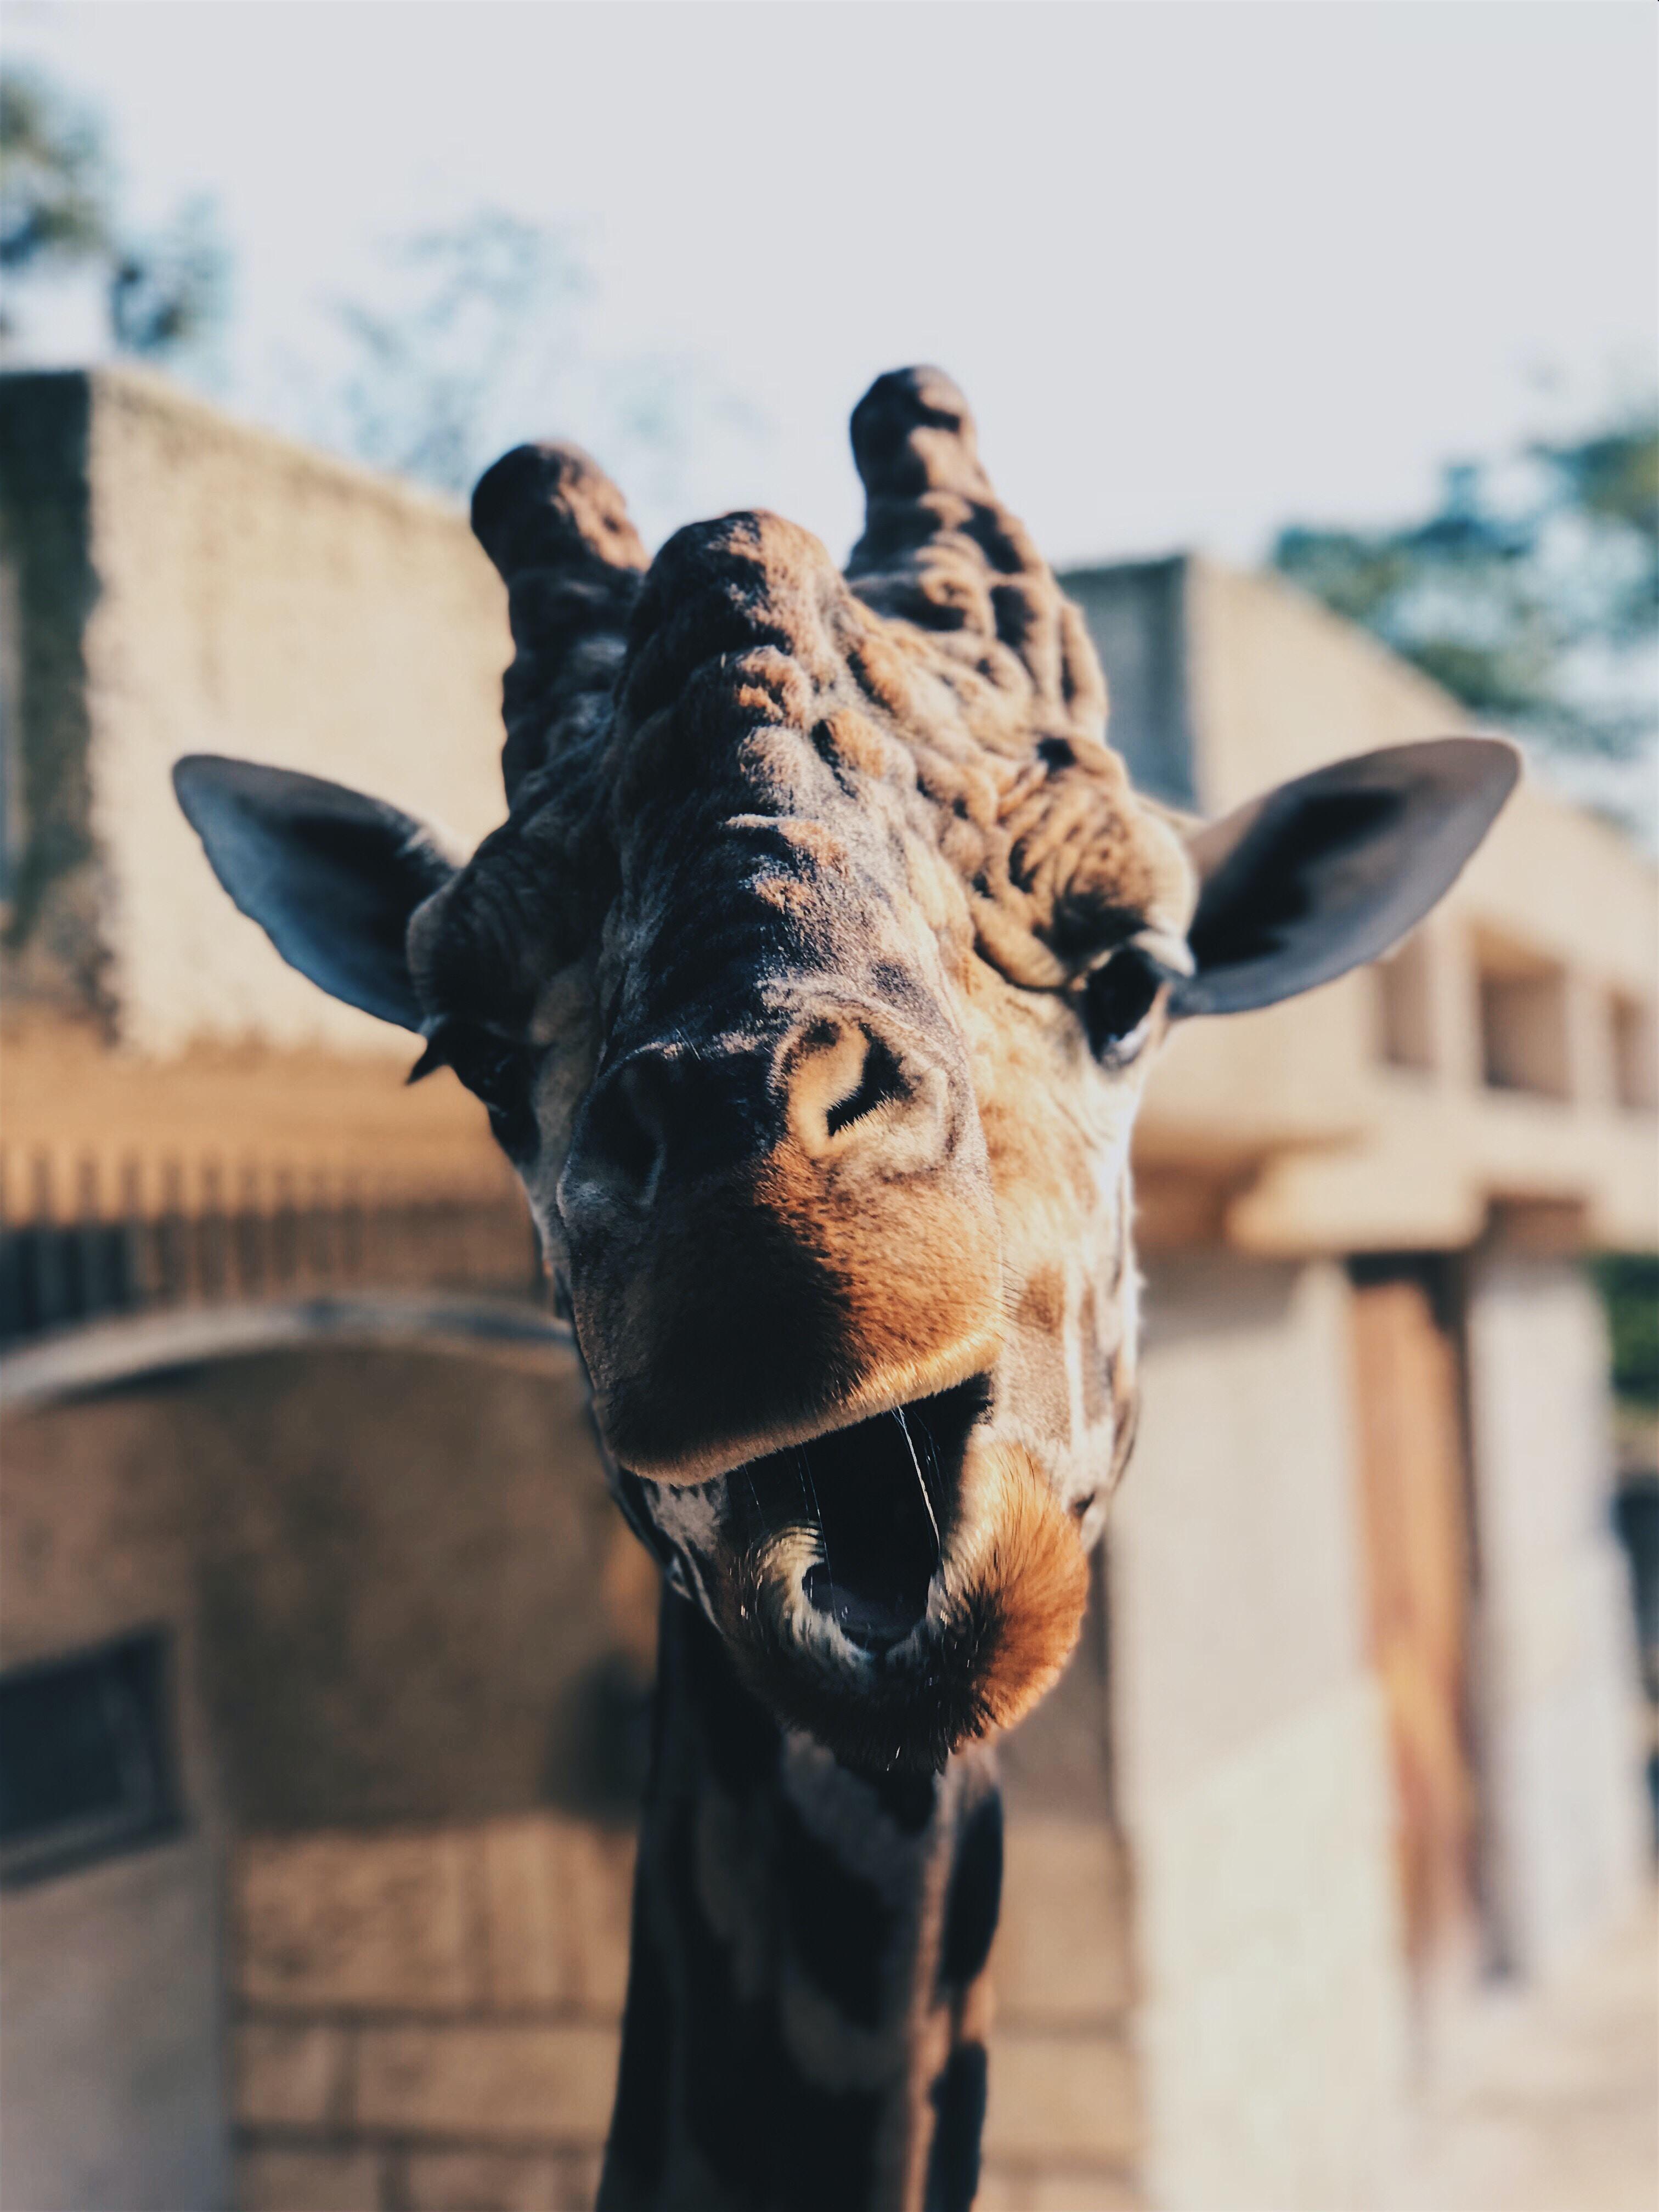 brown Giraffe face